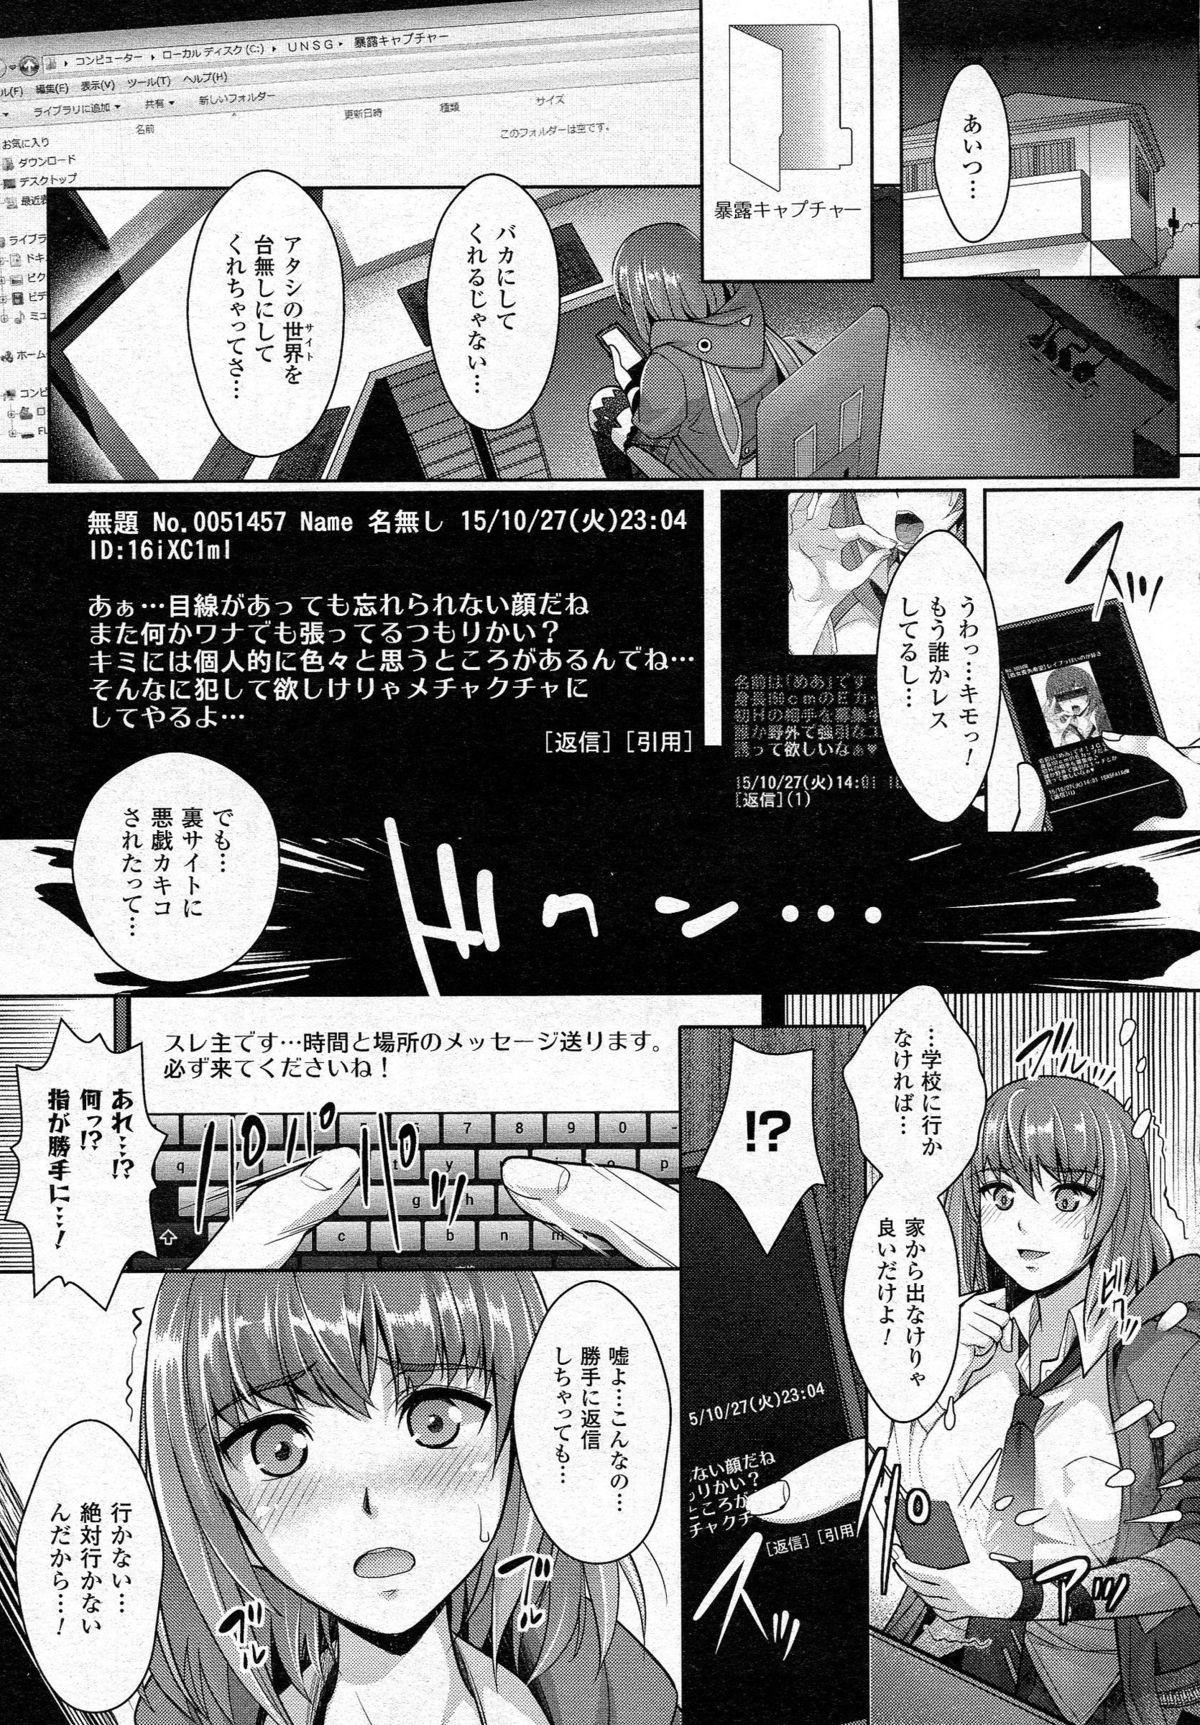 COMIC Unreal 2015-06 Vol. 55 + Hisasi Illust Shuu 253